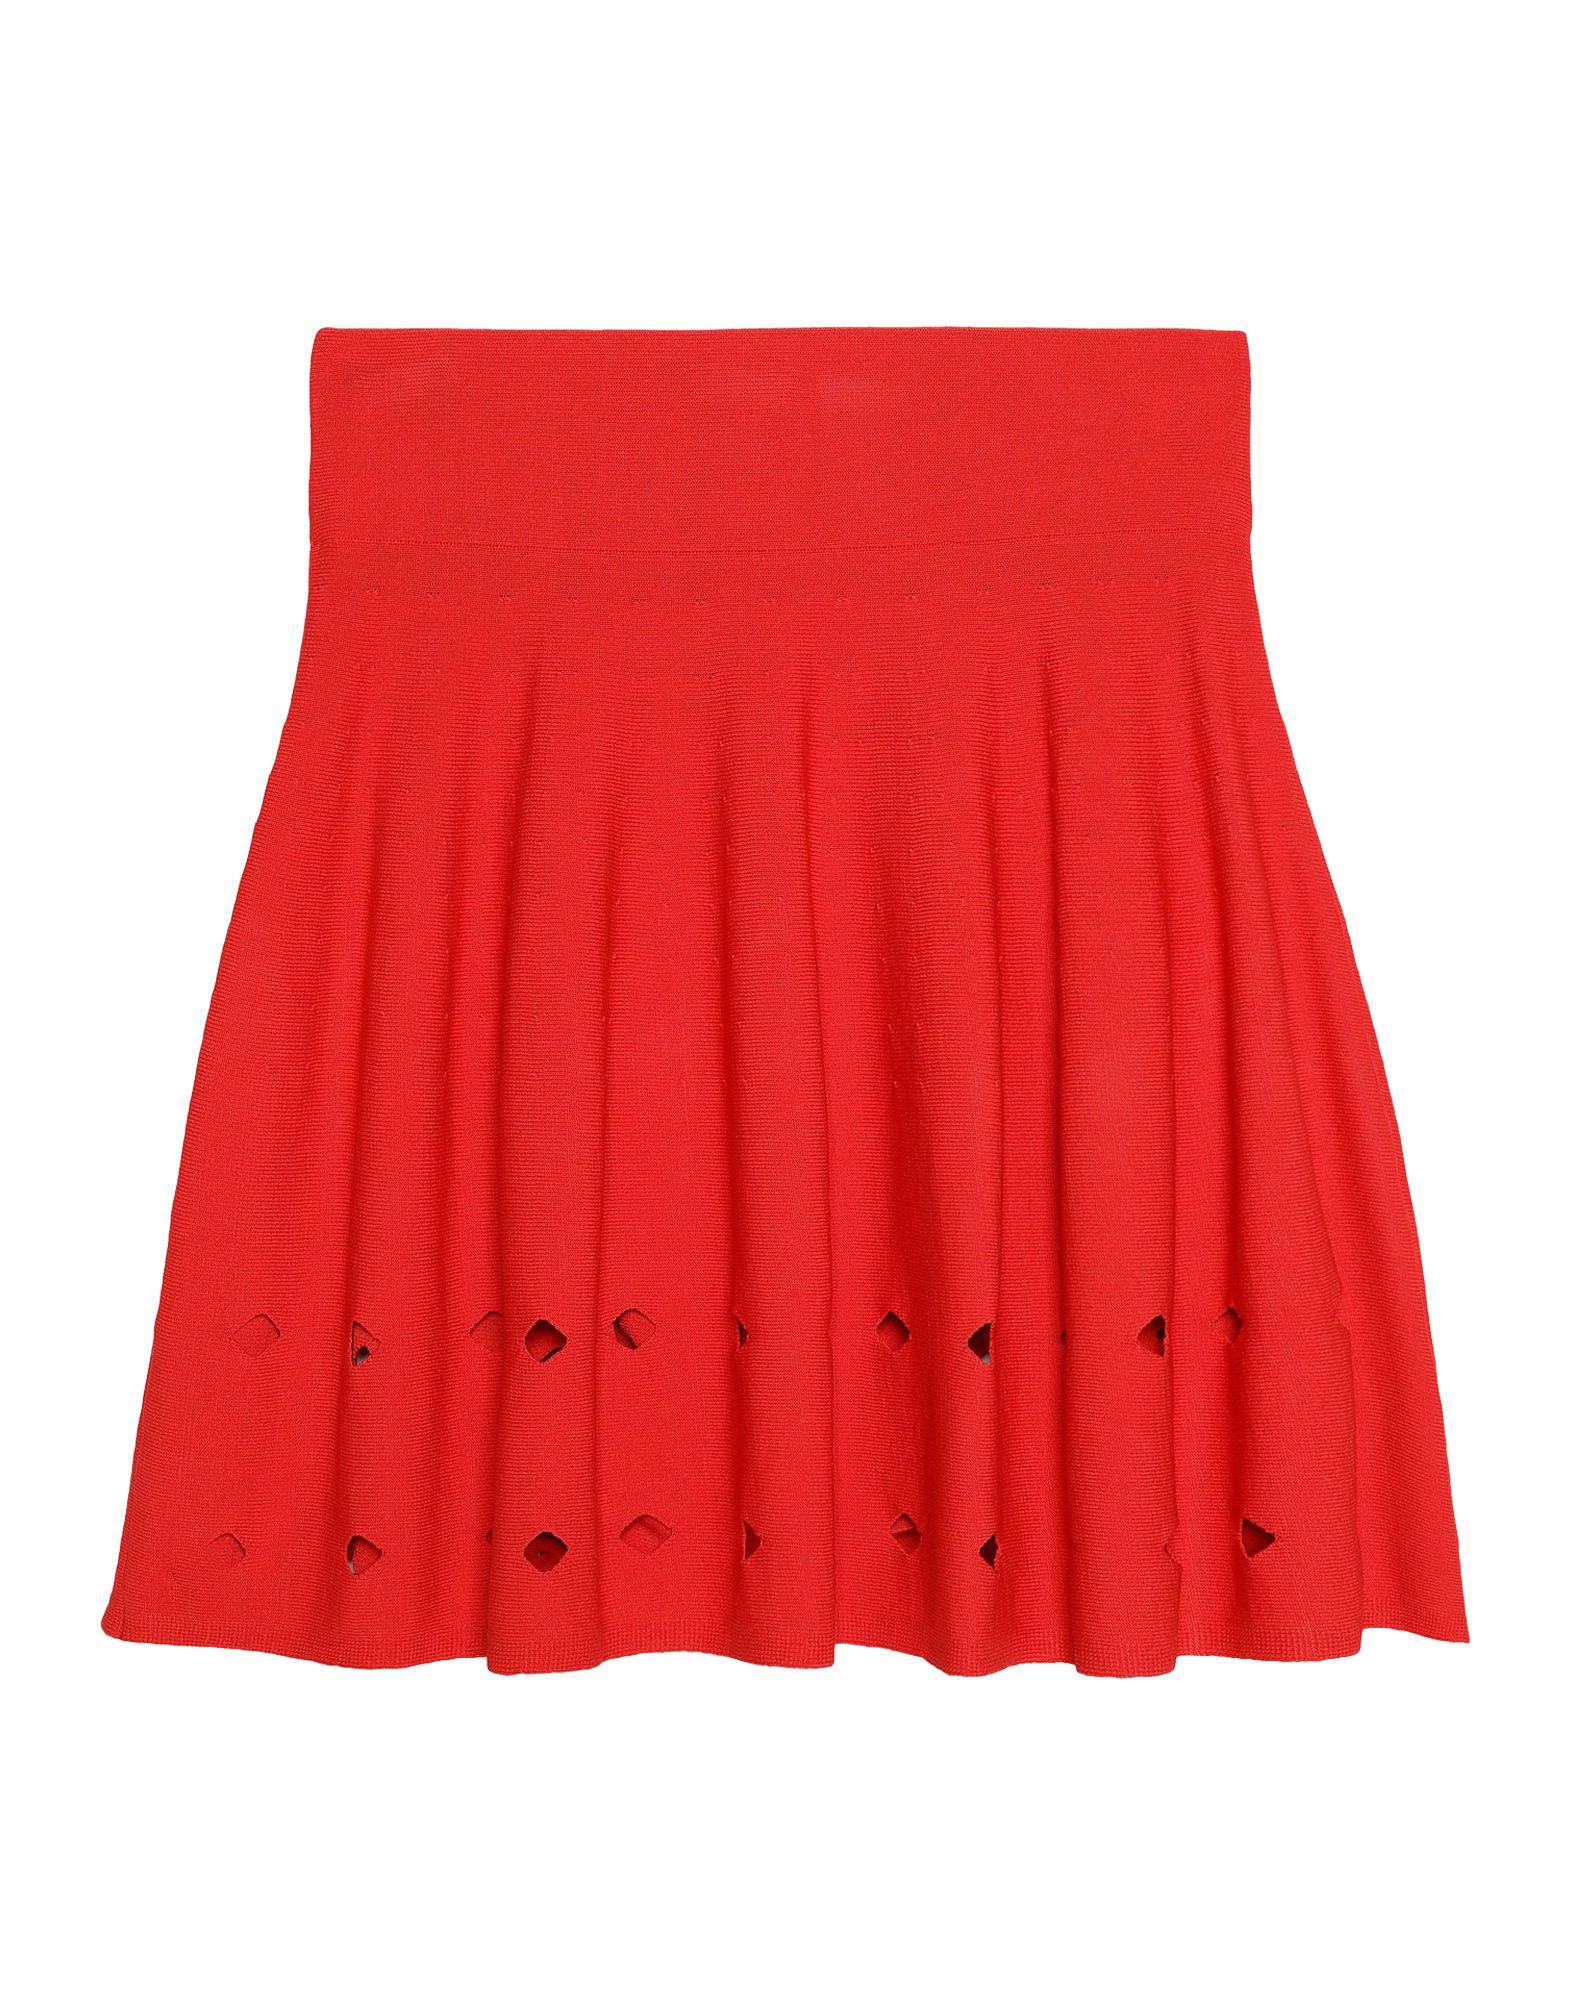 OPENING CEREMONY Мини-юбка юбка opening ceremony юбки трикотажные